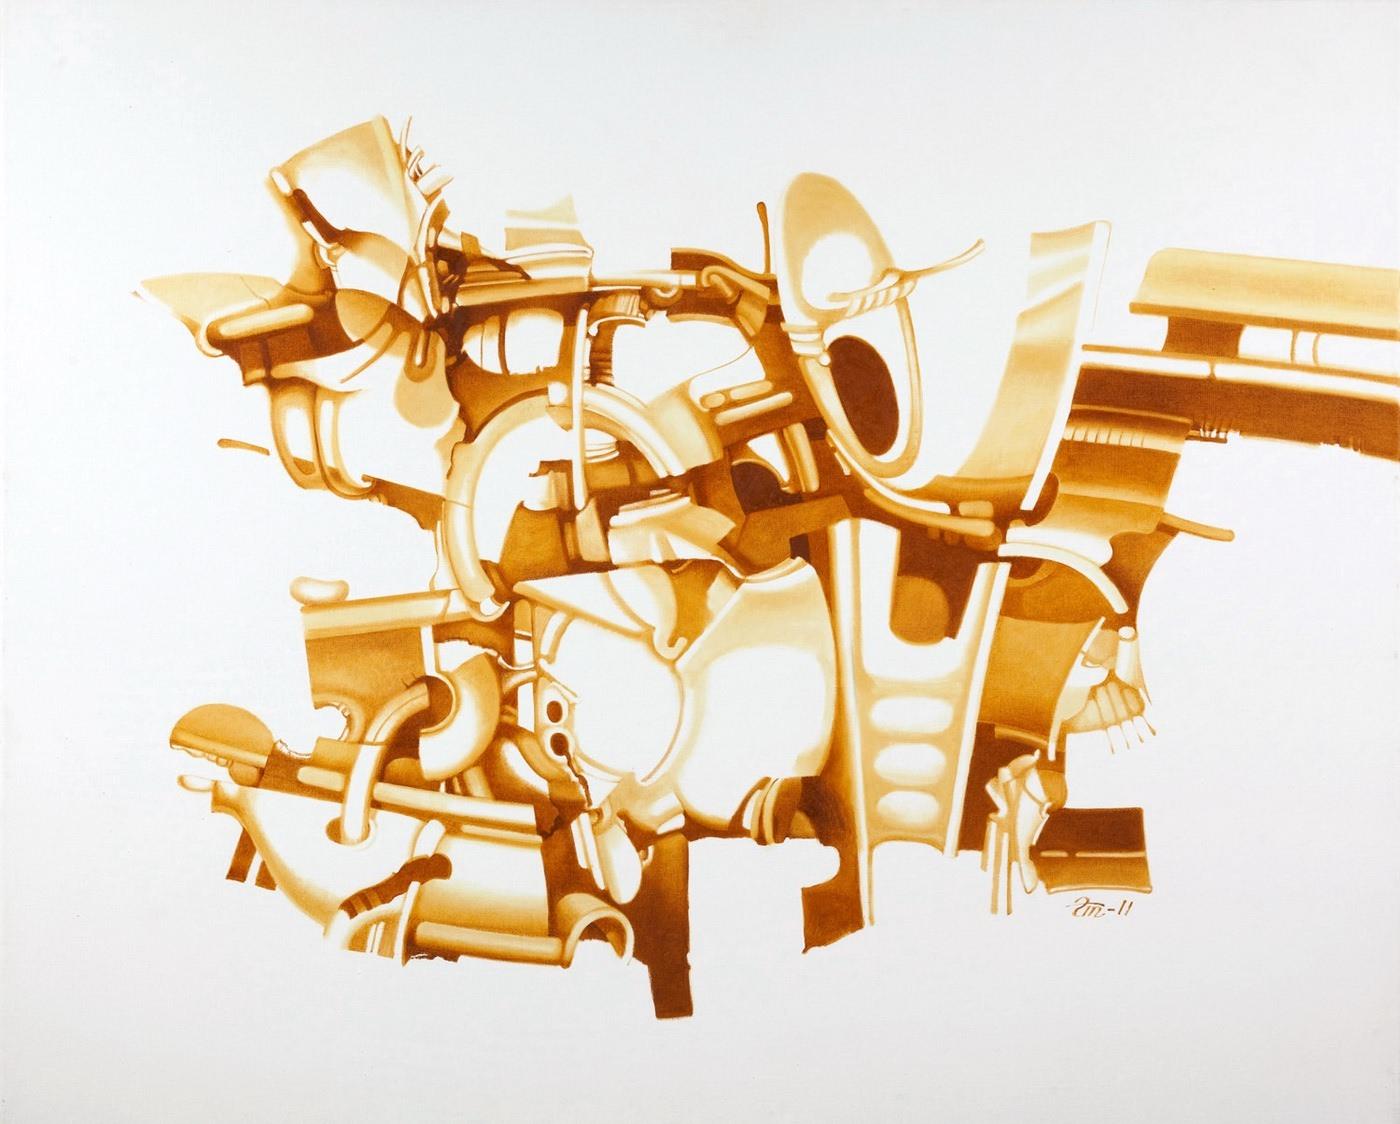 Геннадий Трошков. Импровизация, 2011. Холст, масло, 120x160 Courtesy of the East Meets West Gallery